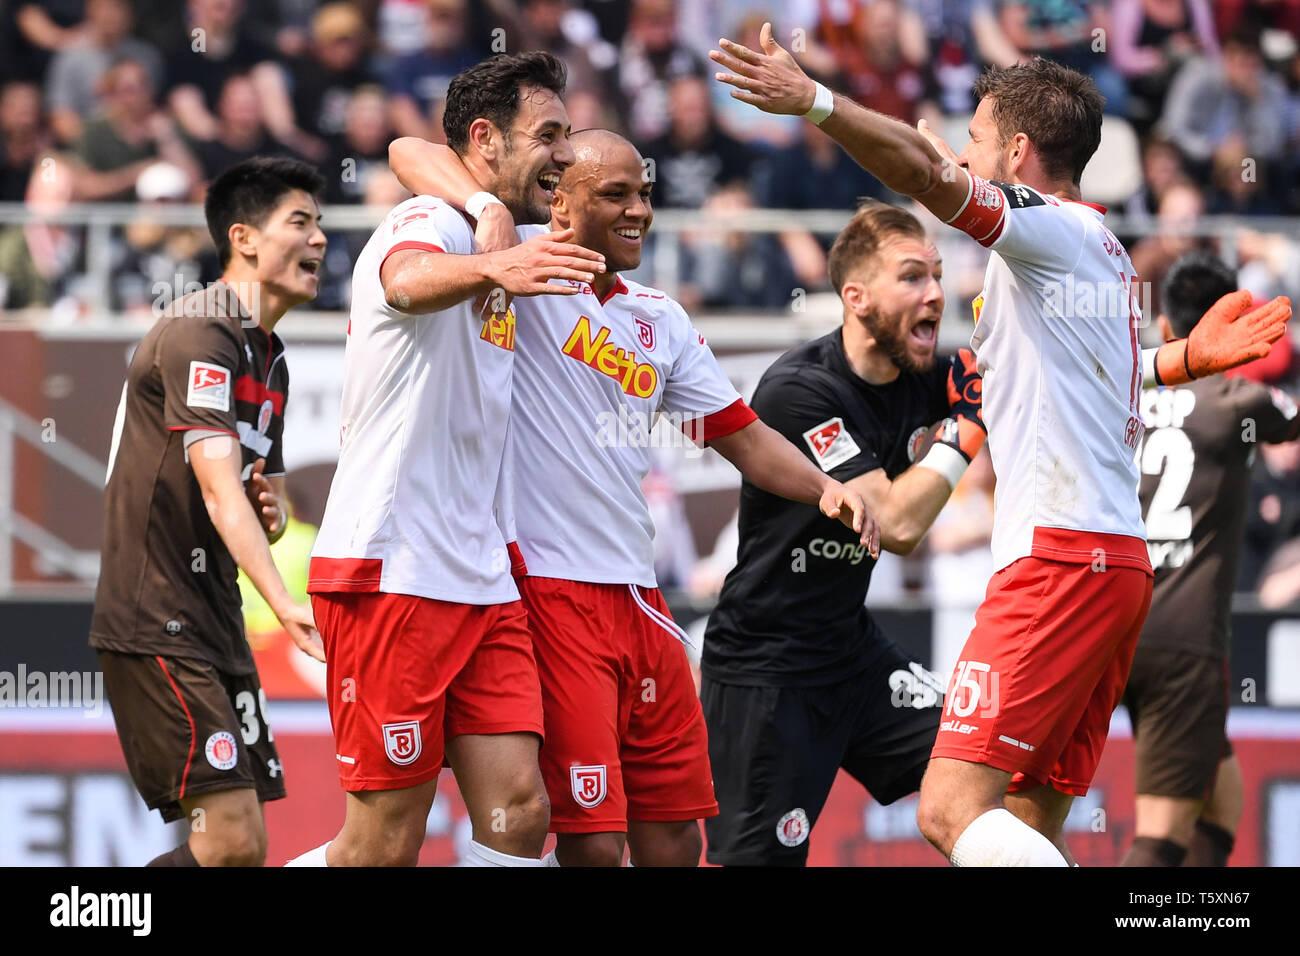 HAMBURG, GERMANY - APRIL 27: Hamadi Al Ghaddioui (L) of SSV Jahn Regensburg celebrates after scoring his team's first goal during the second Bundeslig - Stock Image